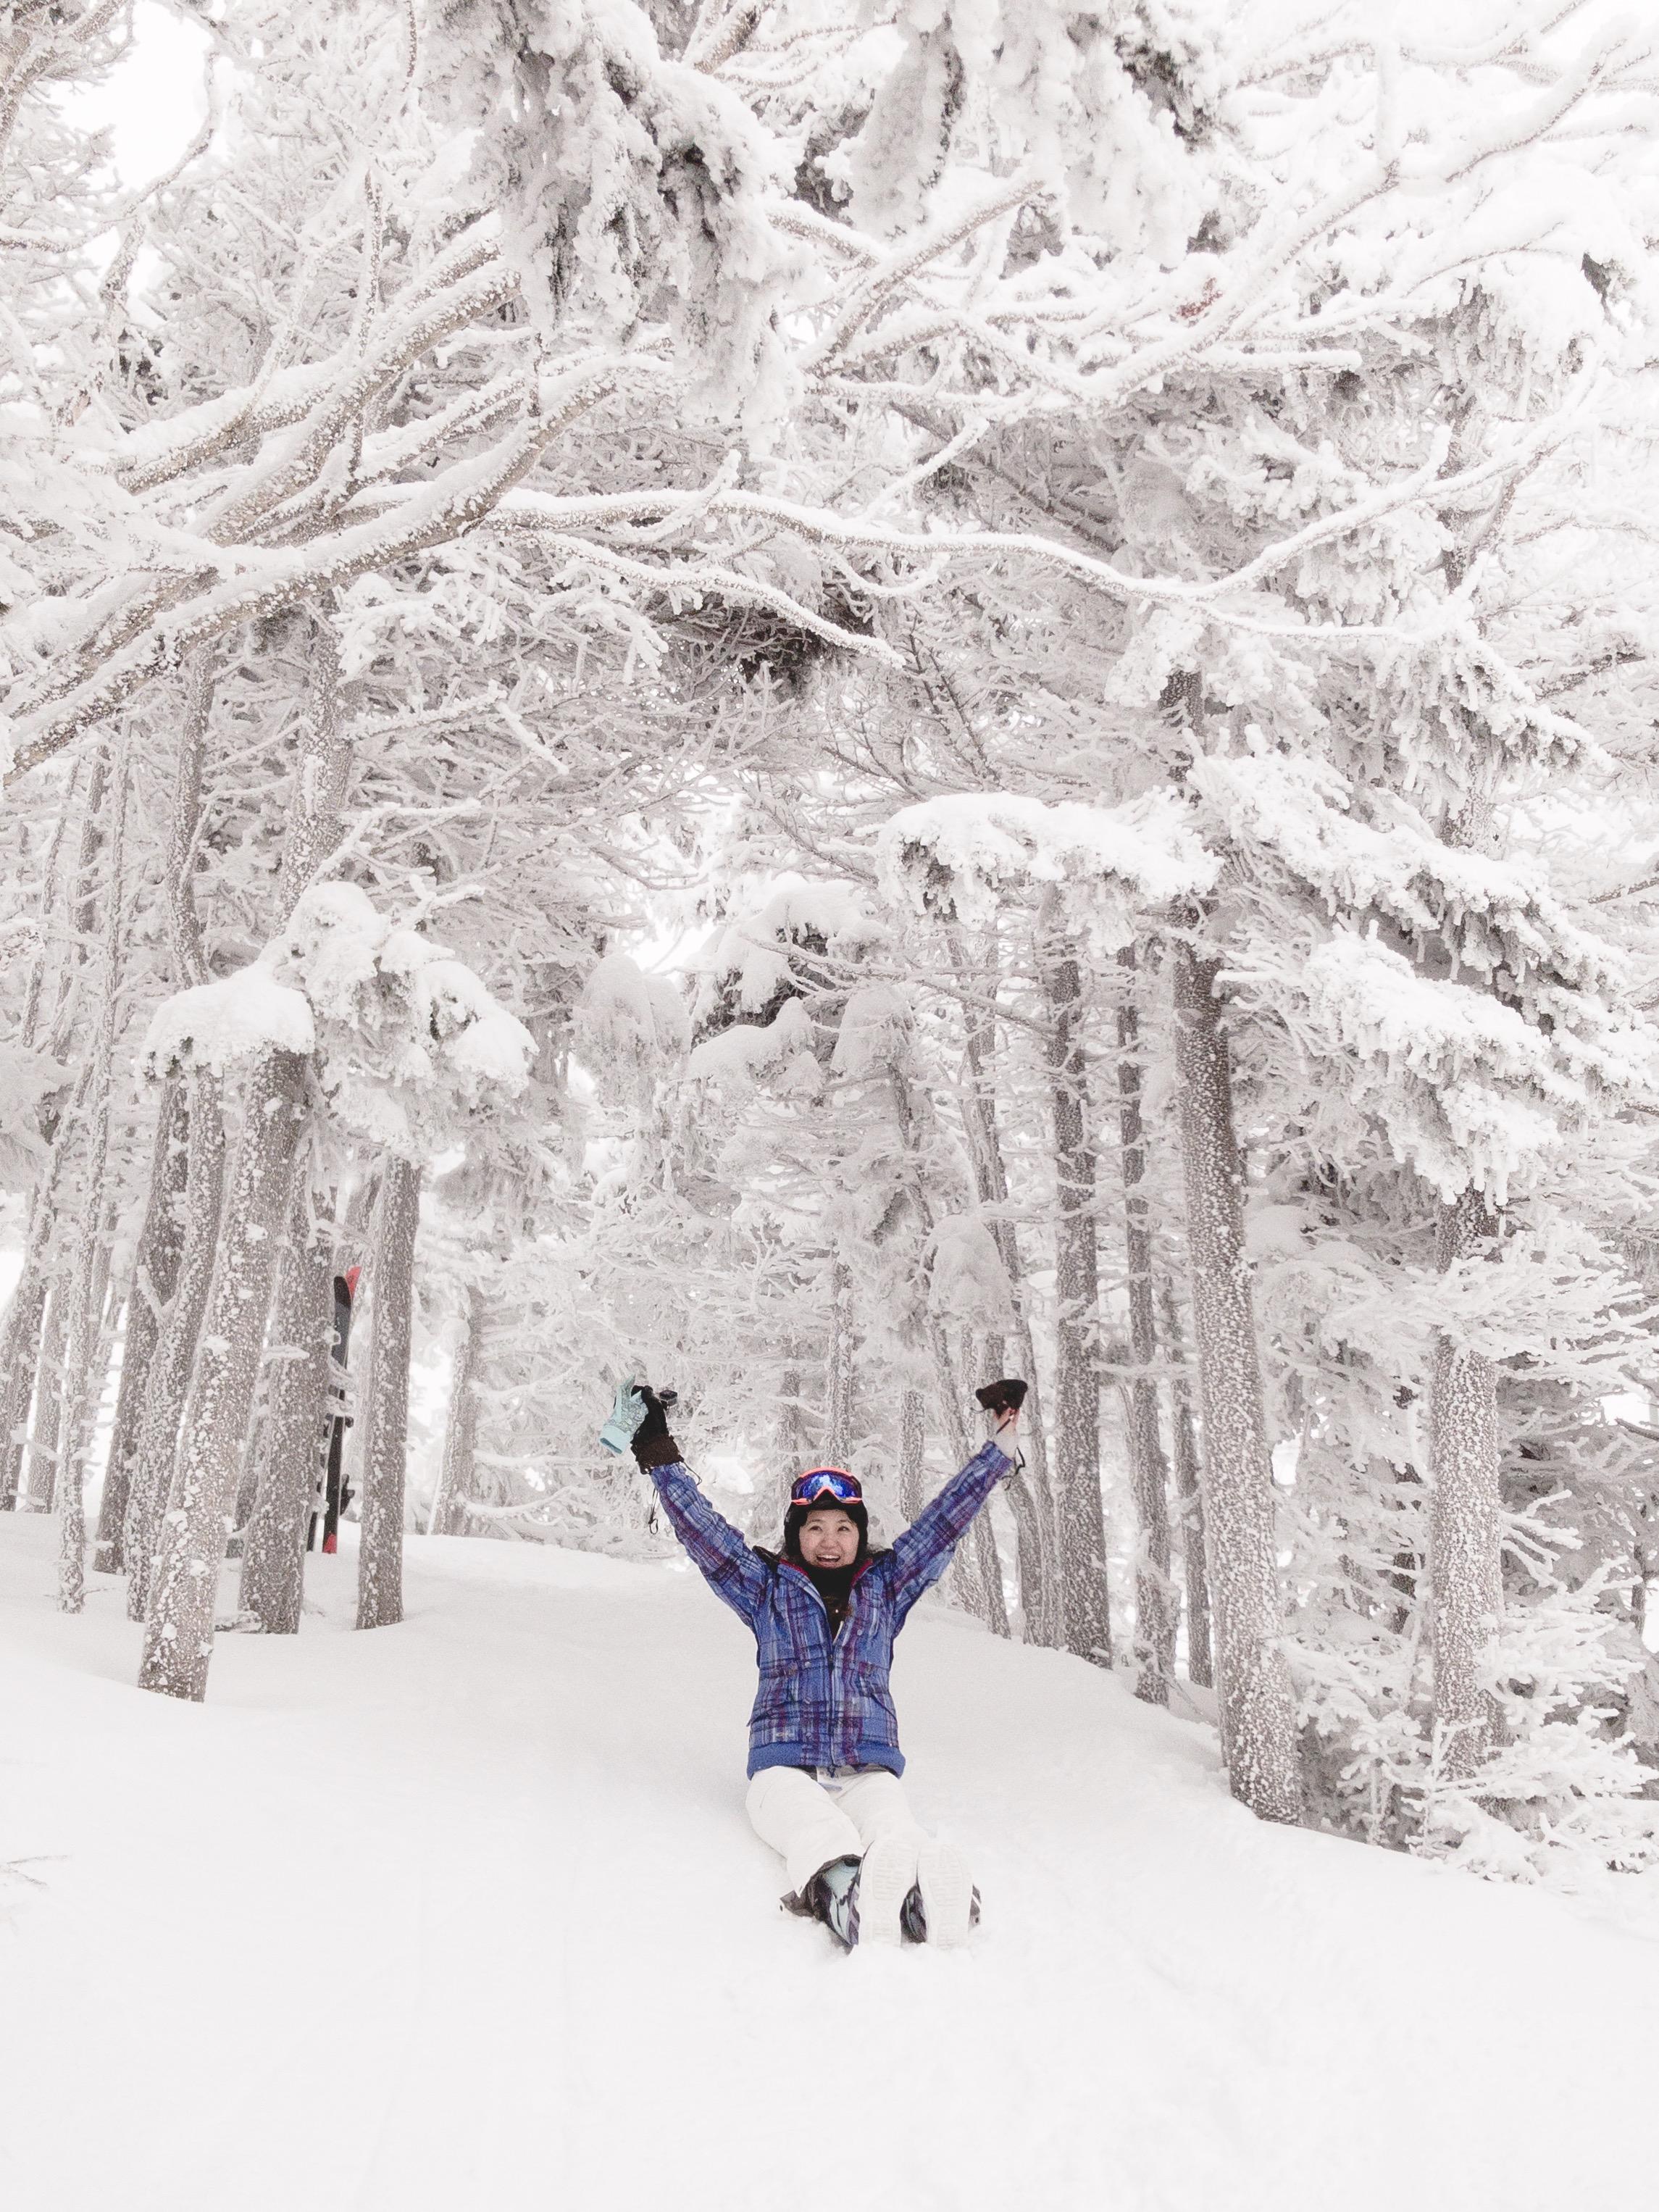 stowe skiing